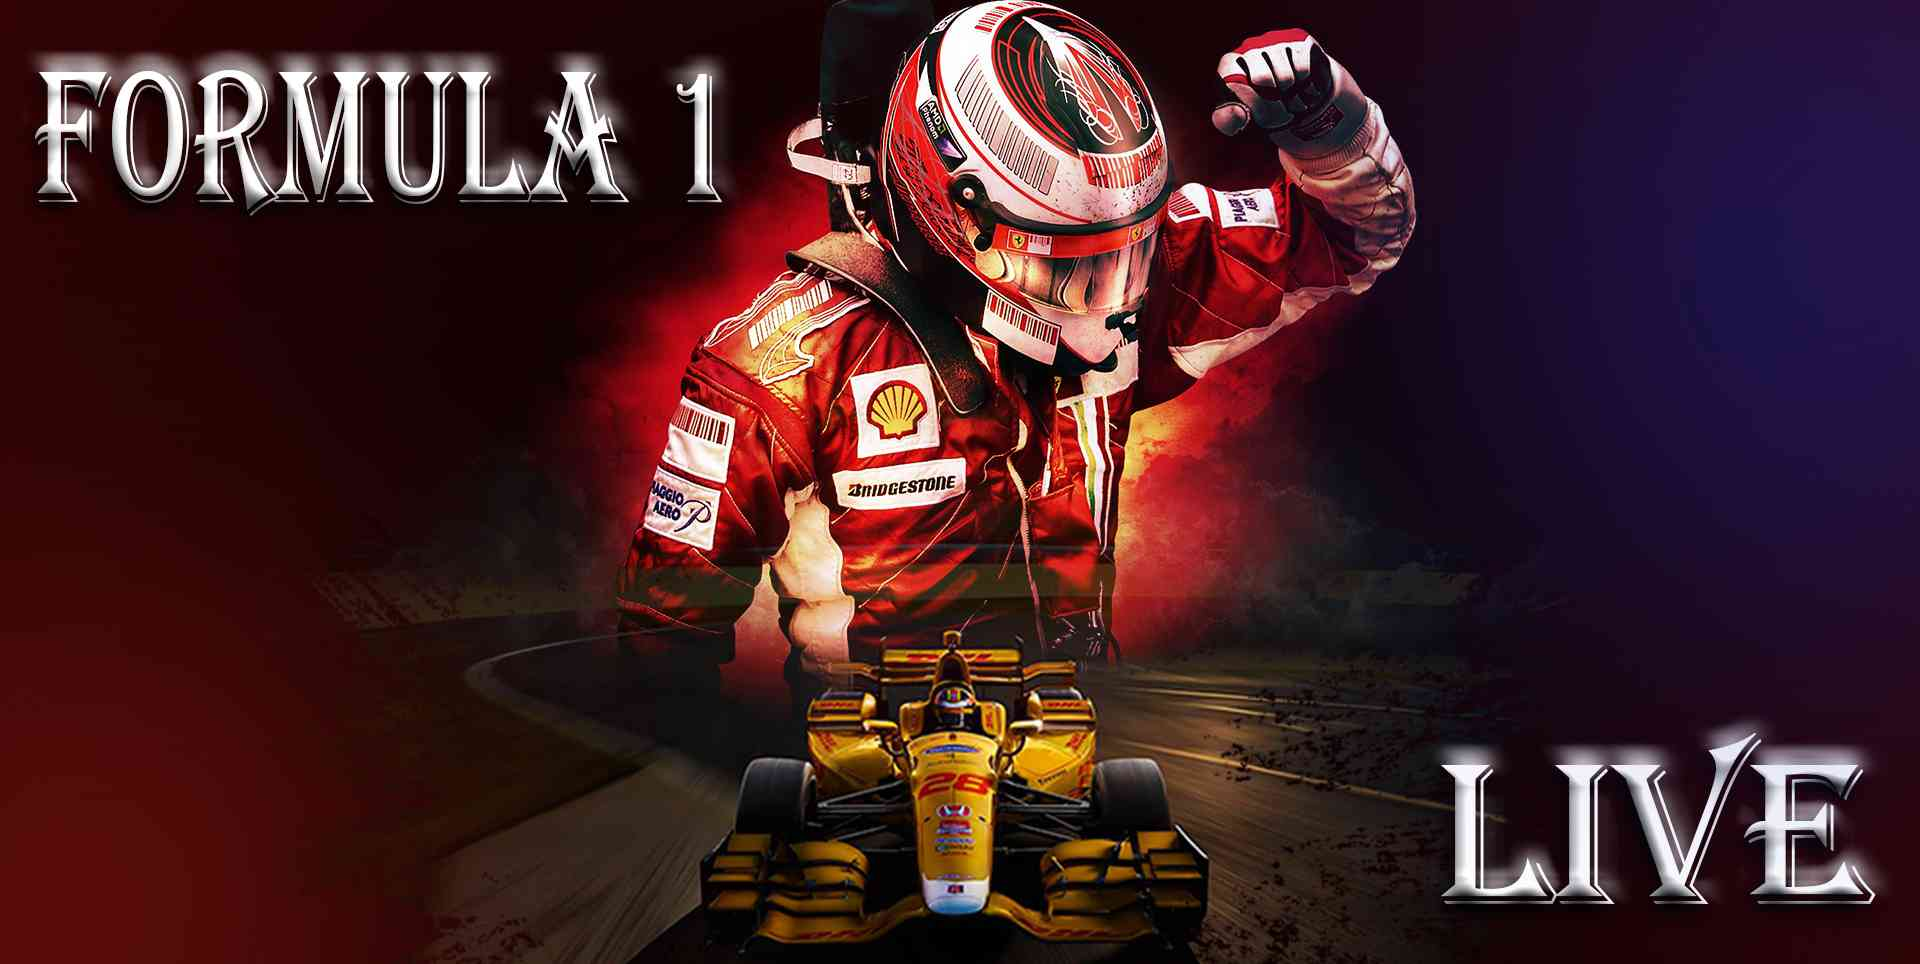 2016-racing-formula-3-paul-ricard-wtcc-france-live